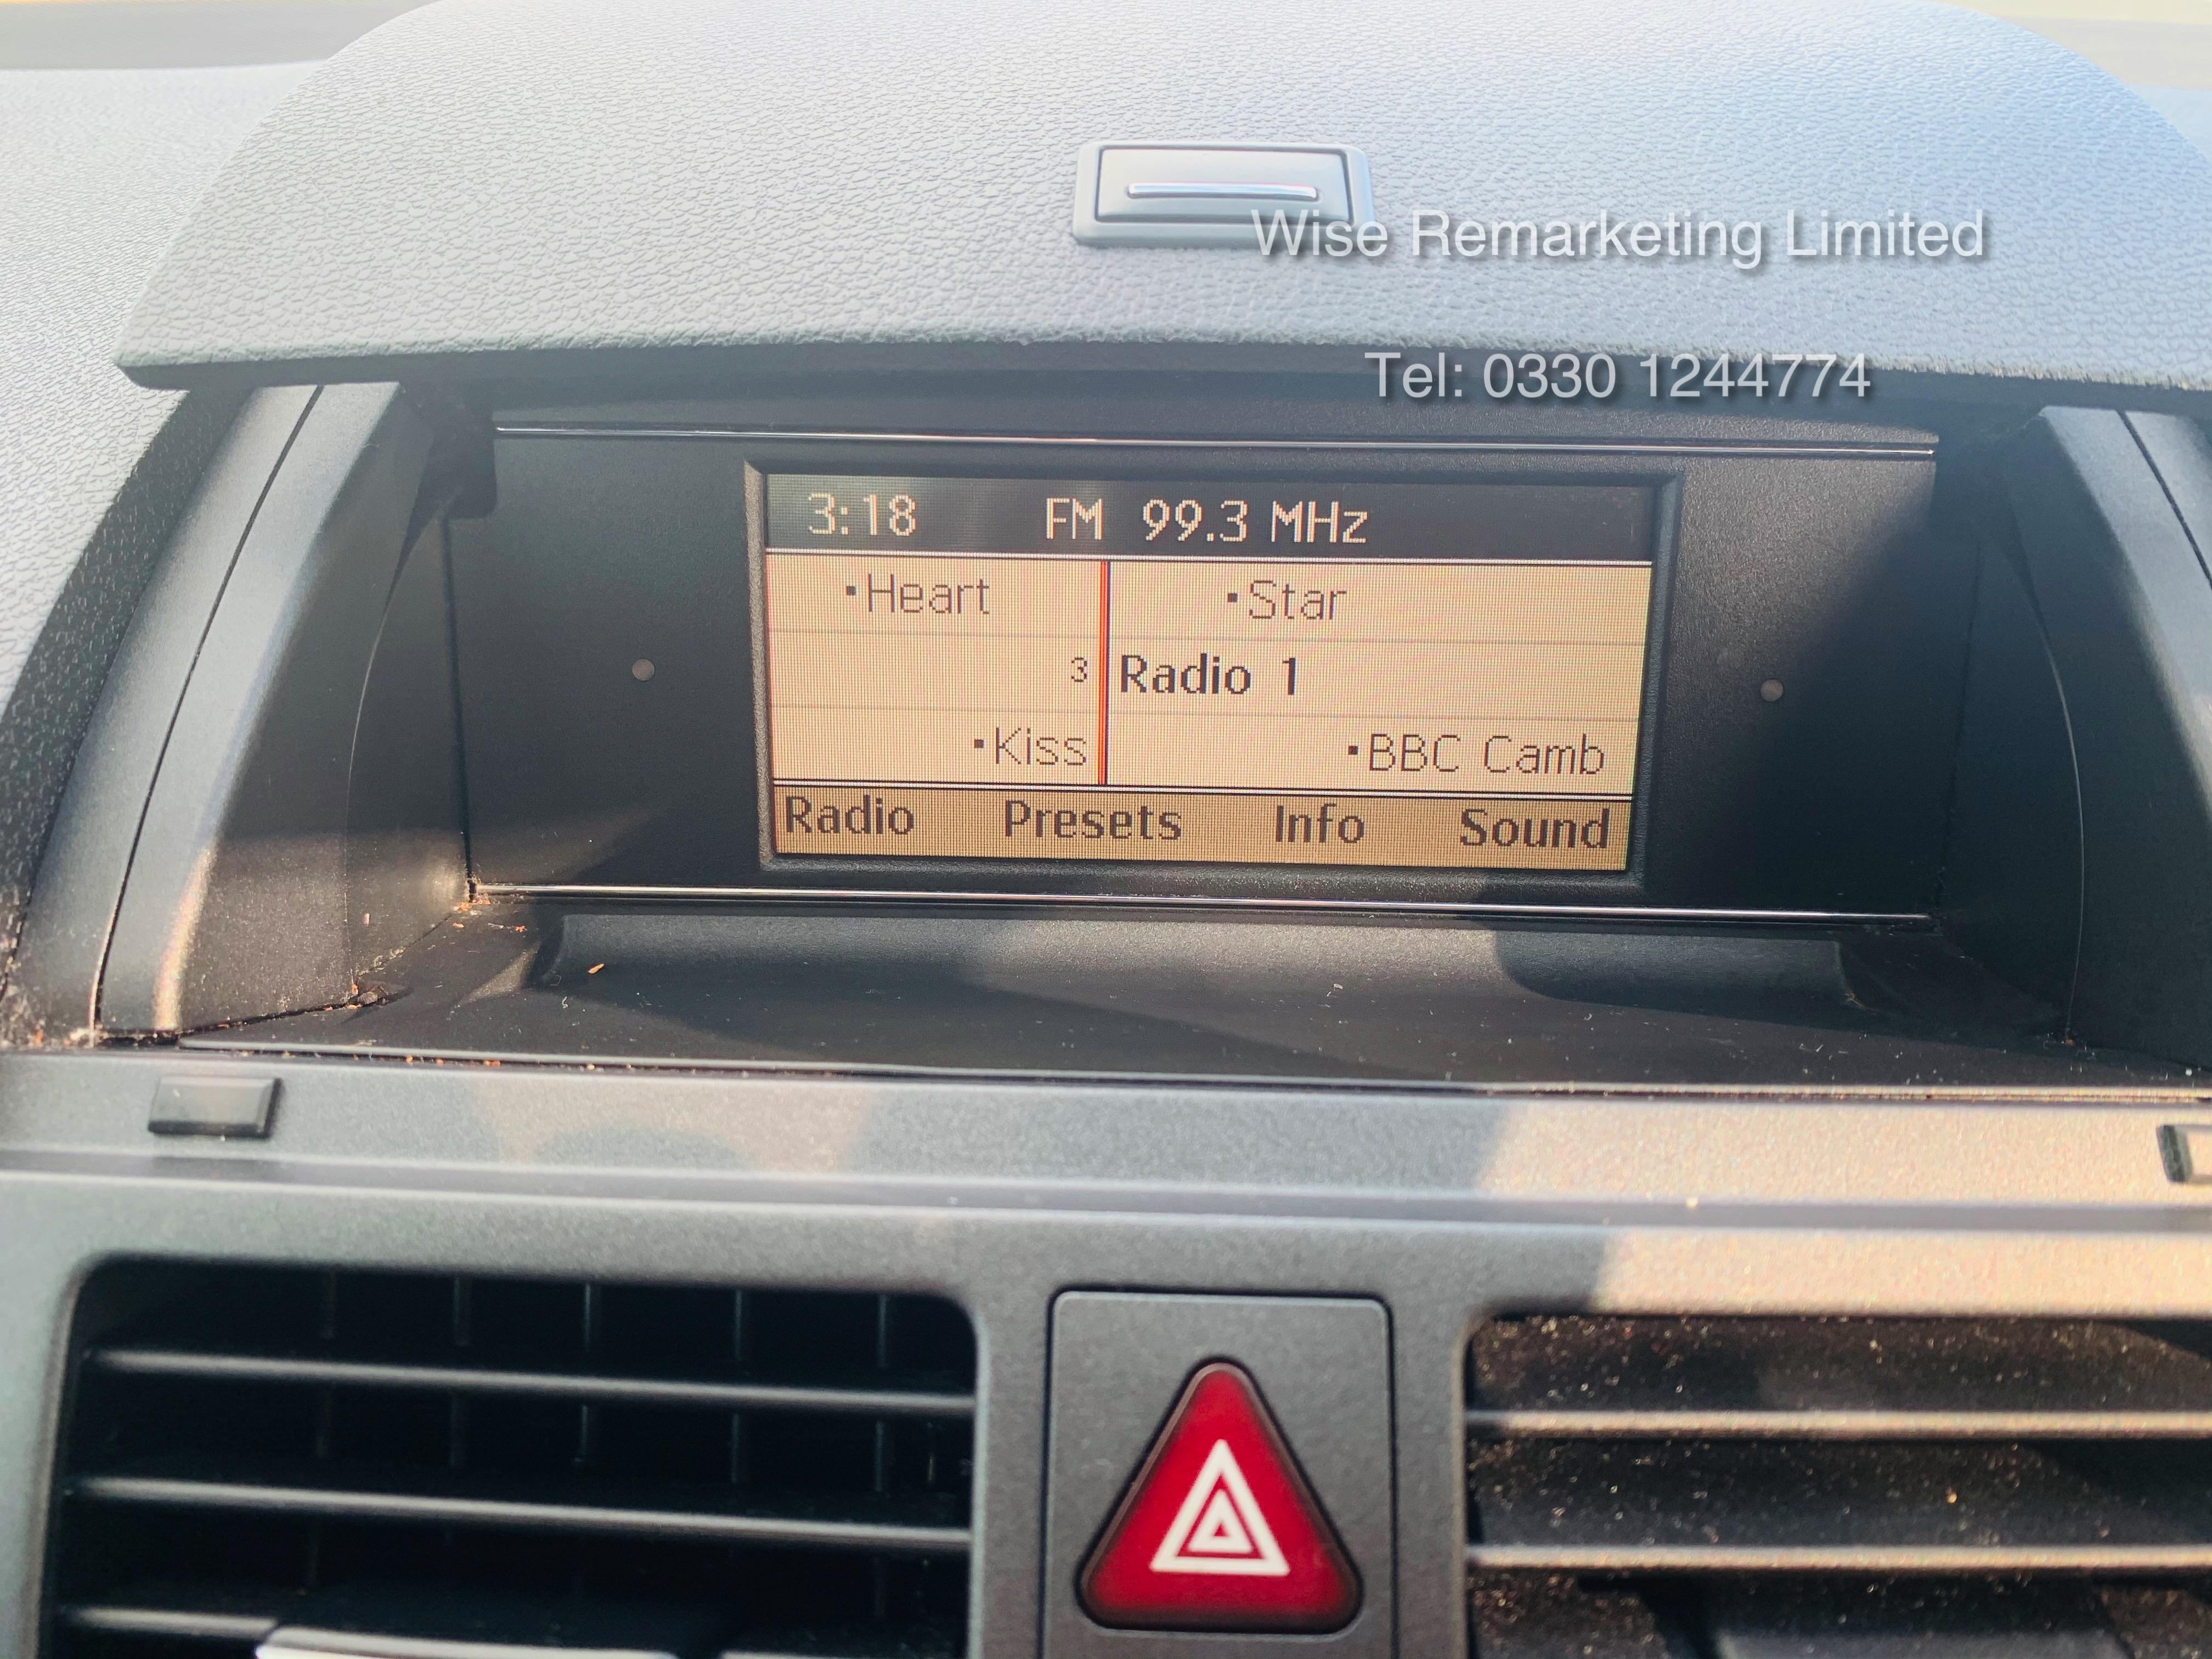 Lot 7 - Mercedes Benz C220 Cdi Blueeff Special Equipment - **Auto** - 2011 Model - Service History